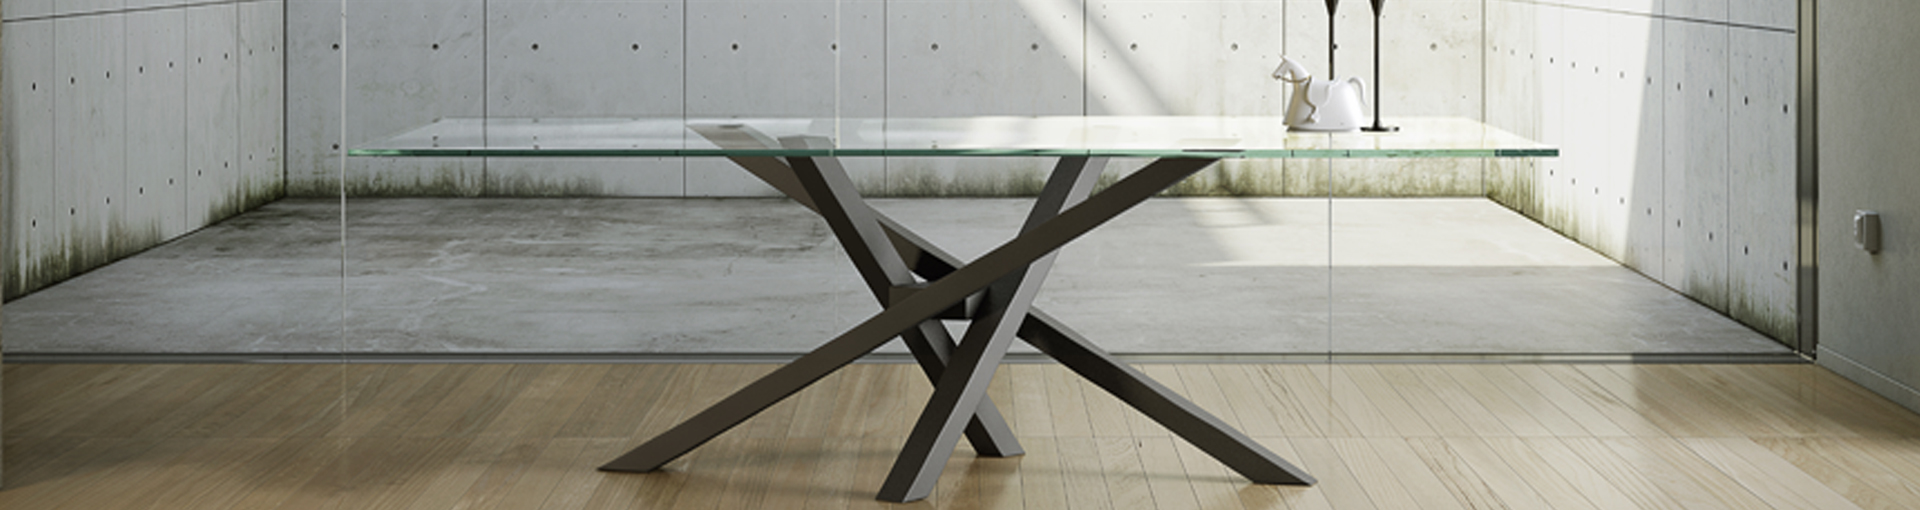 Emejing tavolo shangai riflessi gallery idee arredamento for Riflessi arredamenti napoli